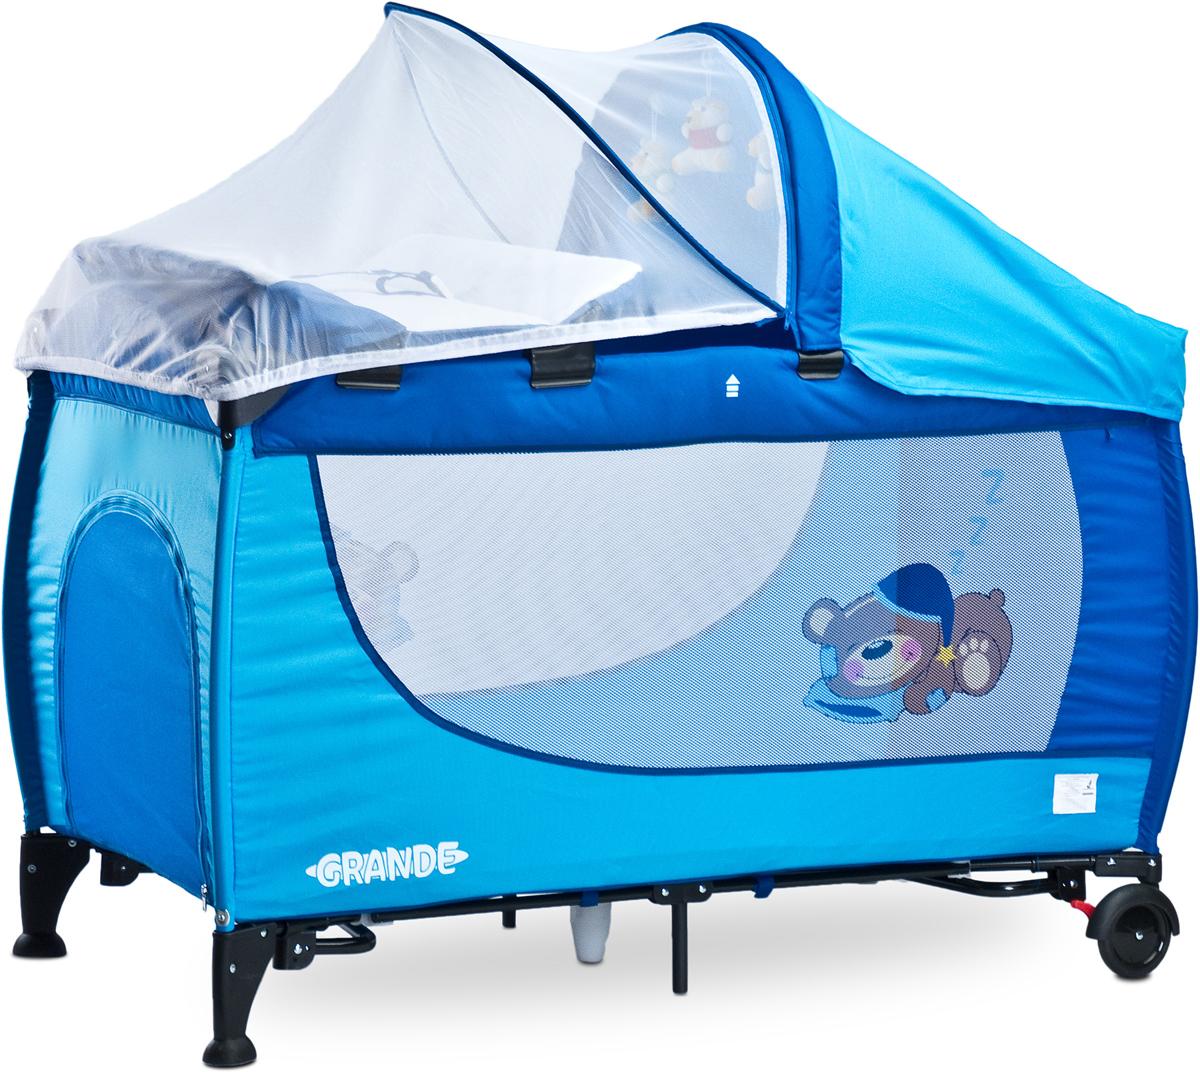 Caretero Манеж-кроватка Grande цвет синий - Детская комната